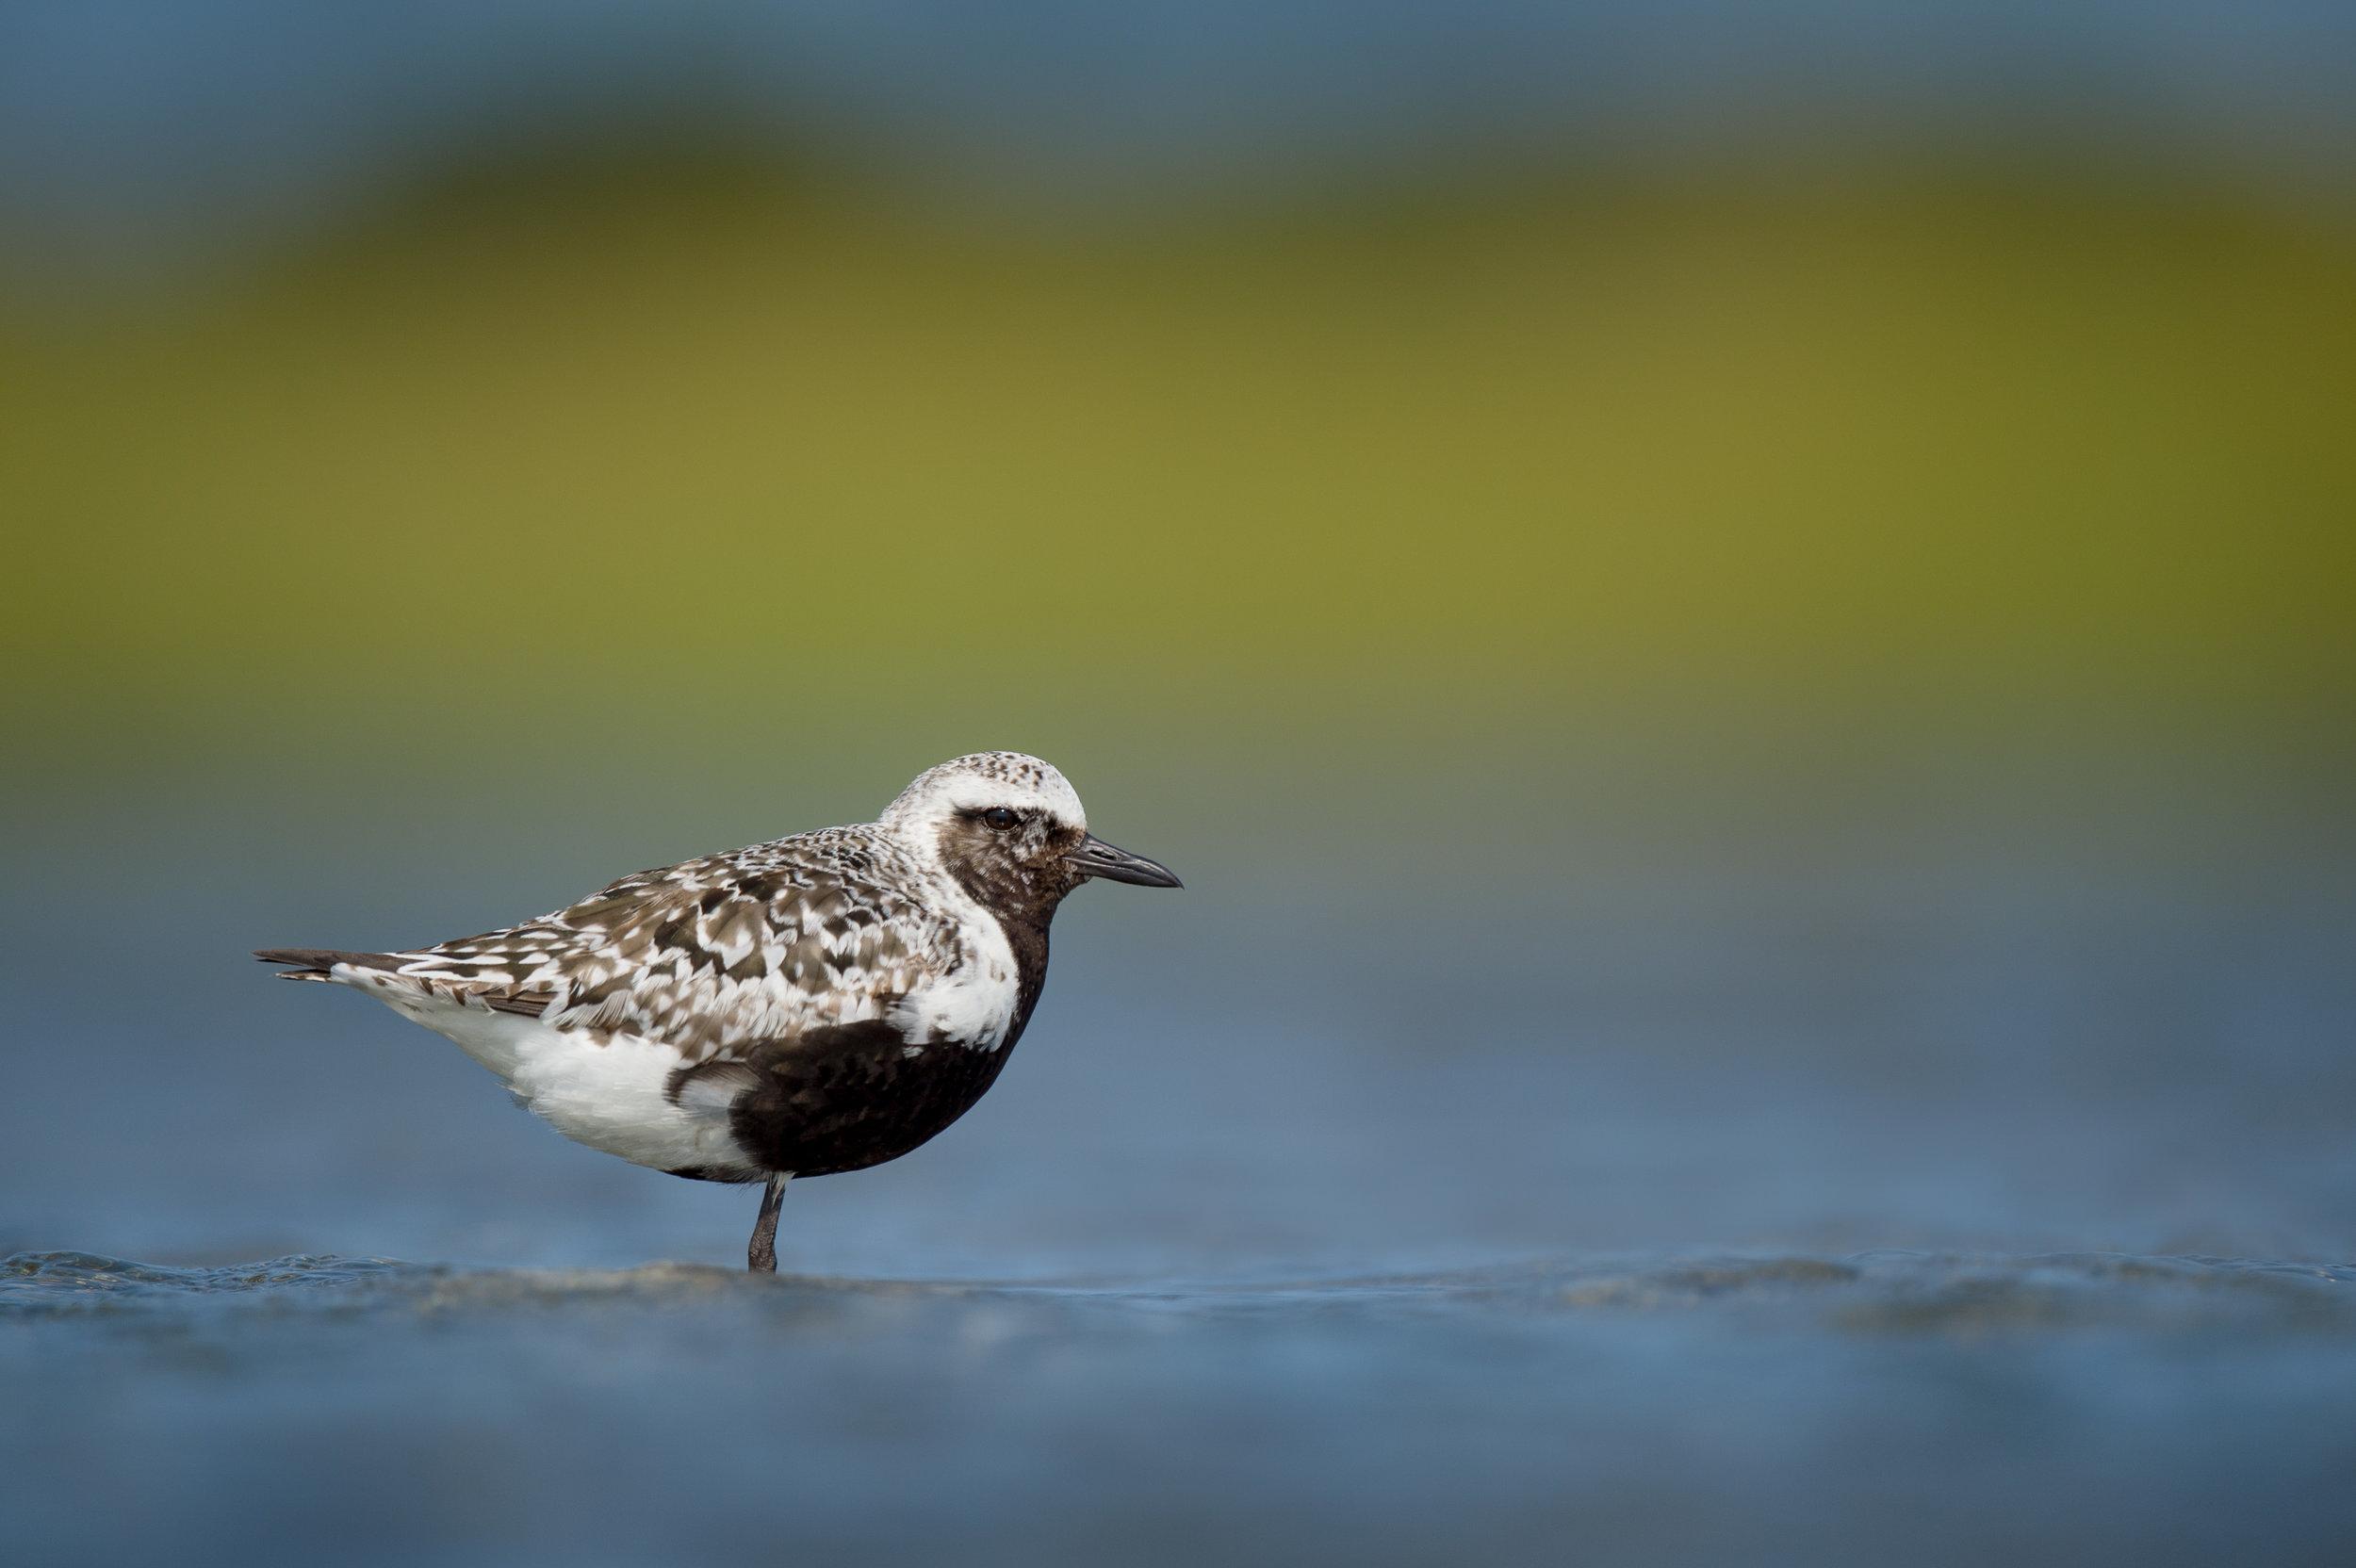 008_jersey_shorebirds.jpg